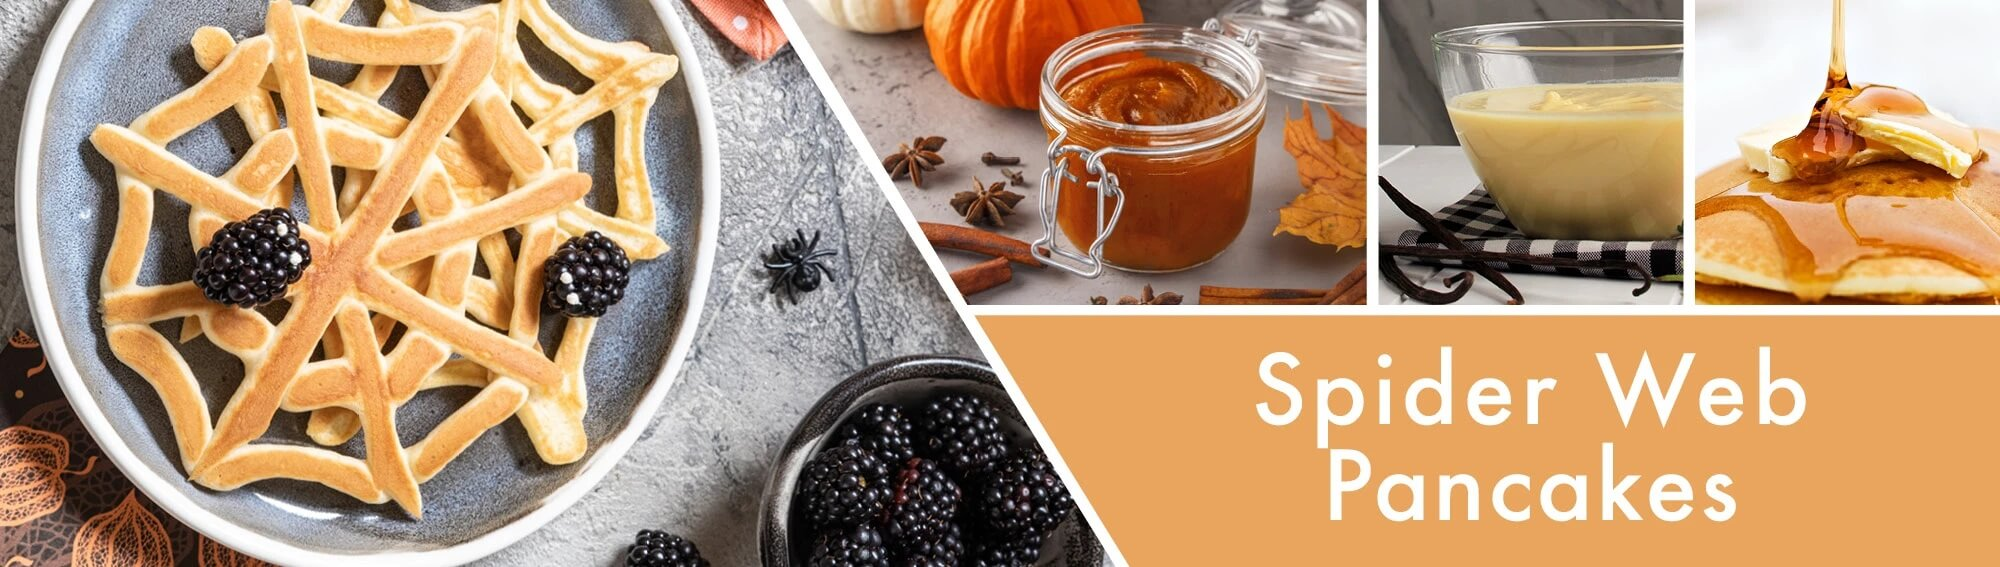 Spider-Web-Pancakes-Banner